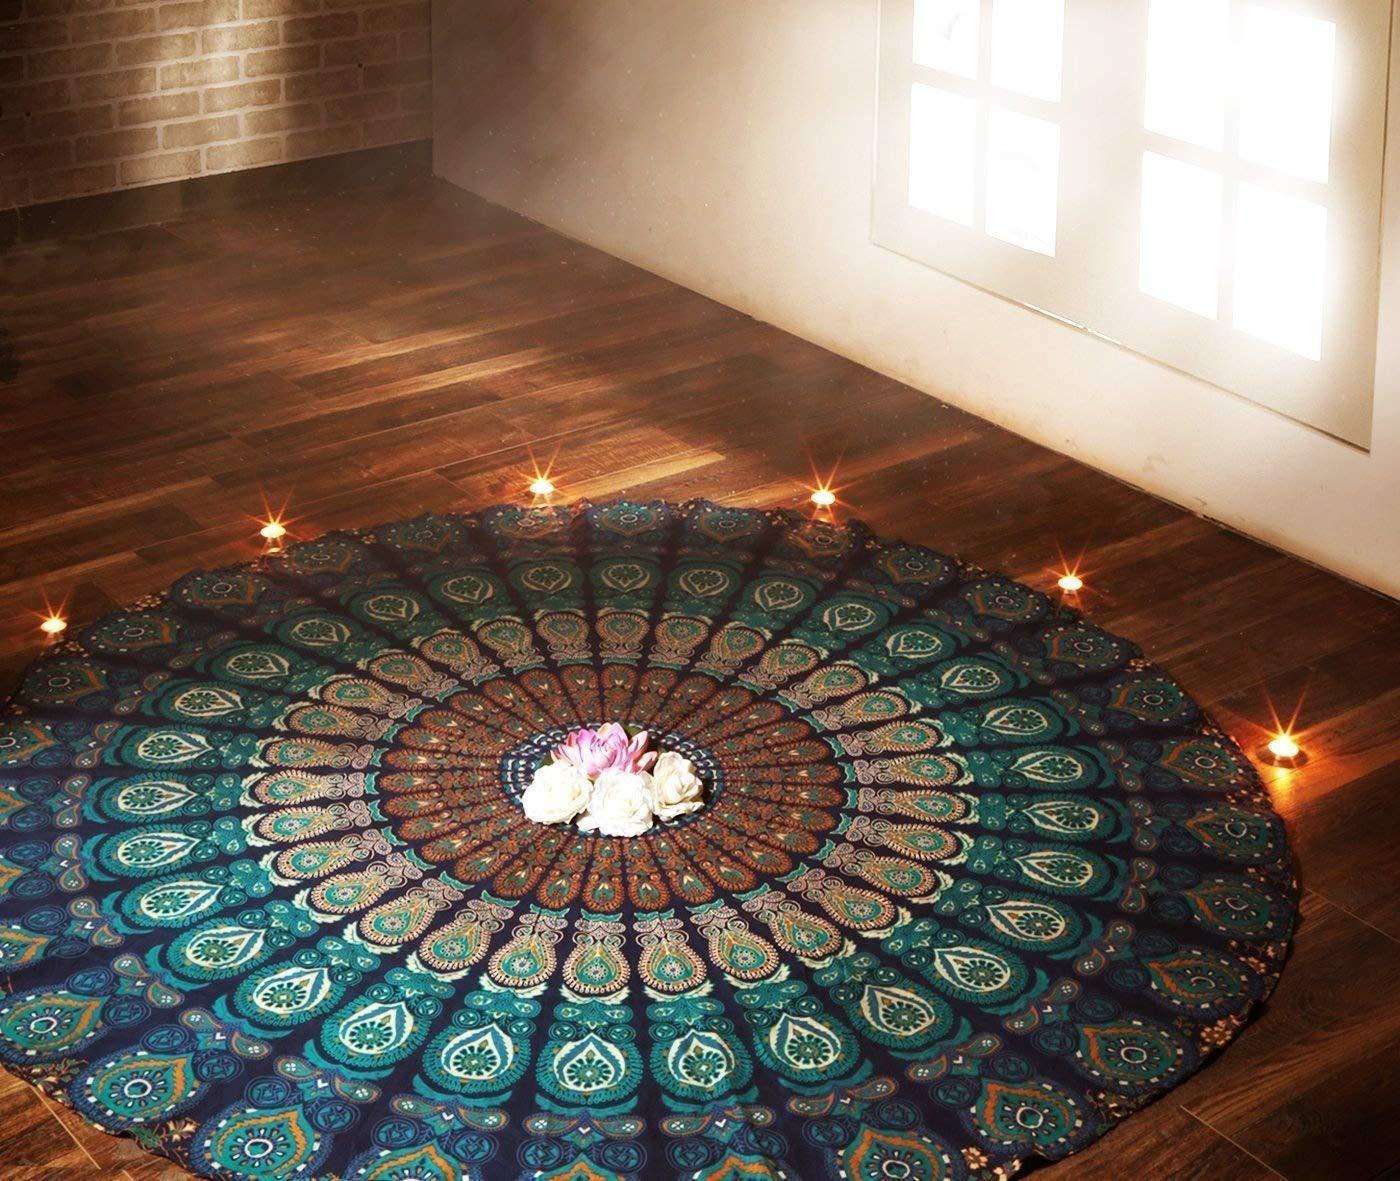 Indian Mandala Round Roundie Beach Throw Tapestry Hippy Boho Gypsy Cotton Tablecloth Beach Towel Round Yoga Mat Blue Rajrang WHG08240